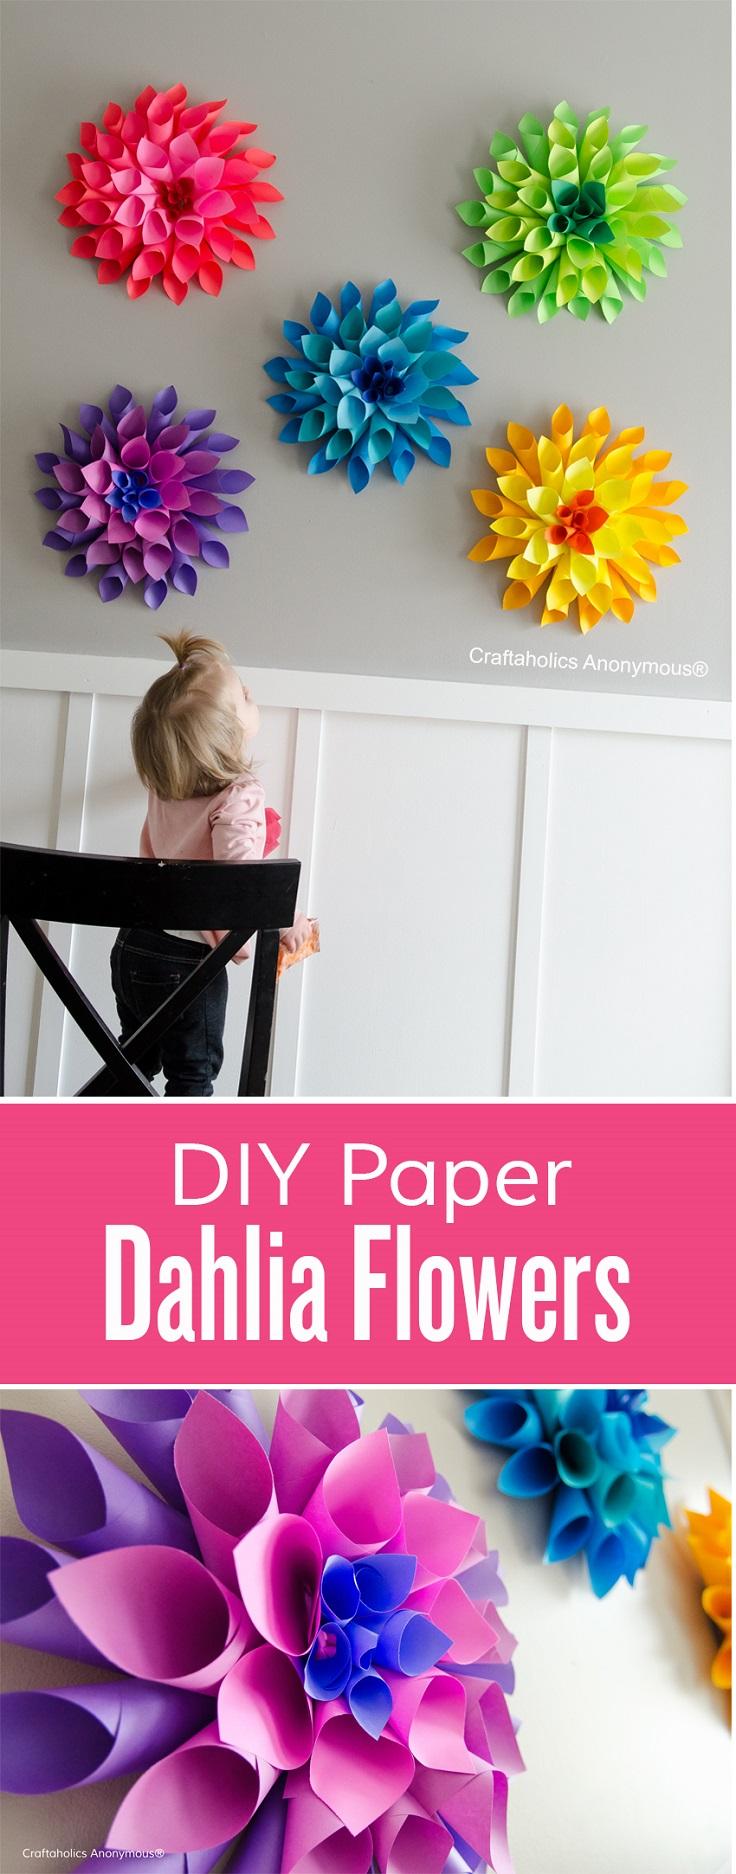 Rainbow-Paper-Dahlia-Flowers